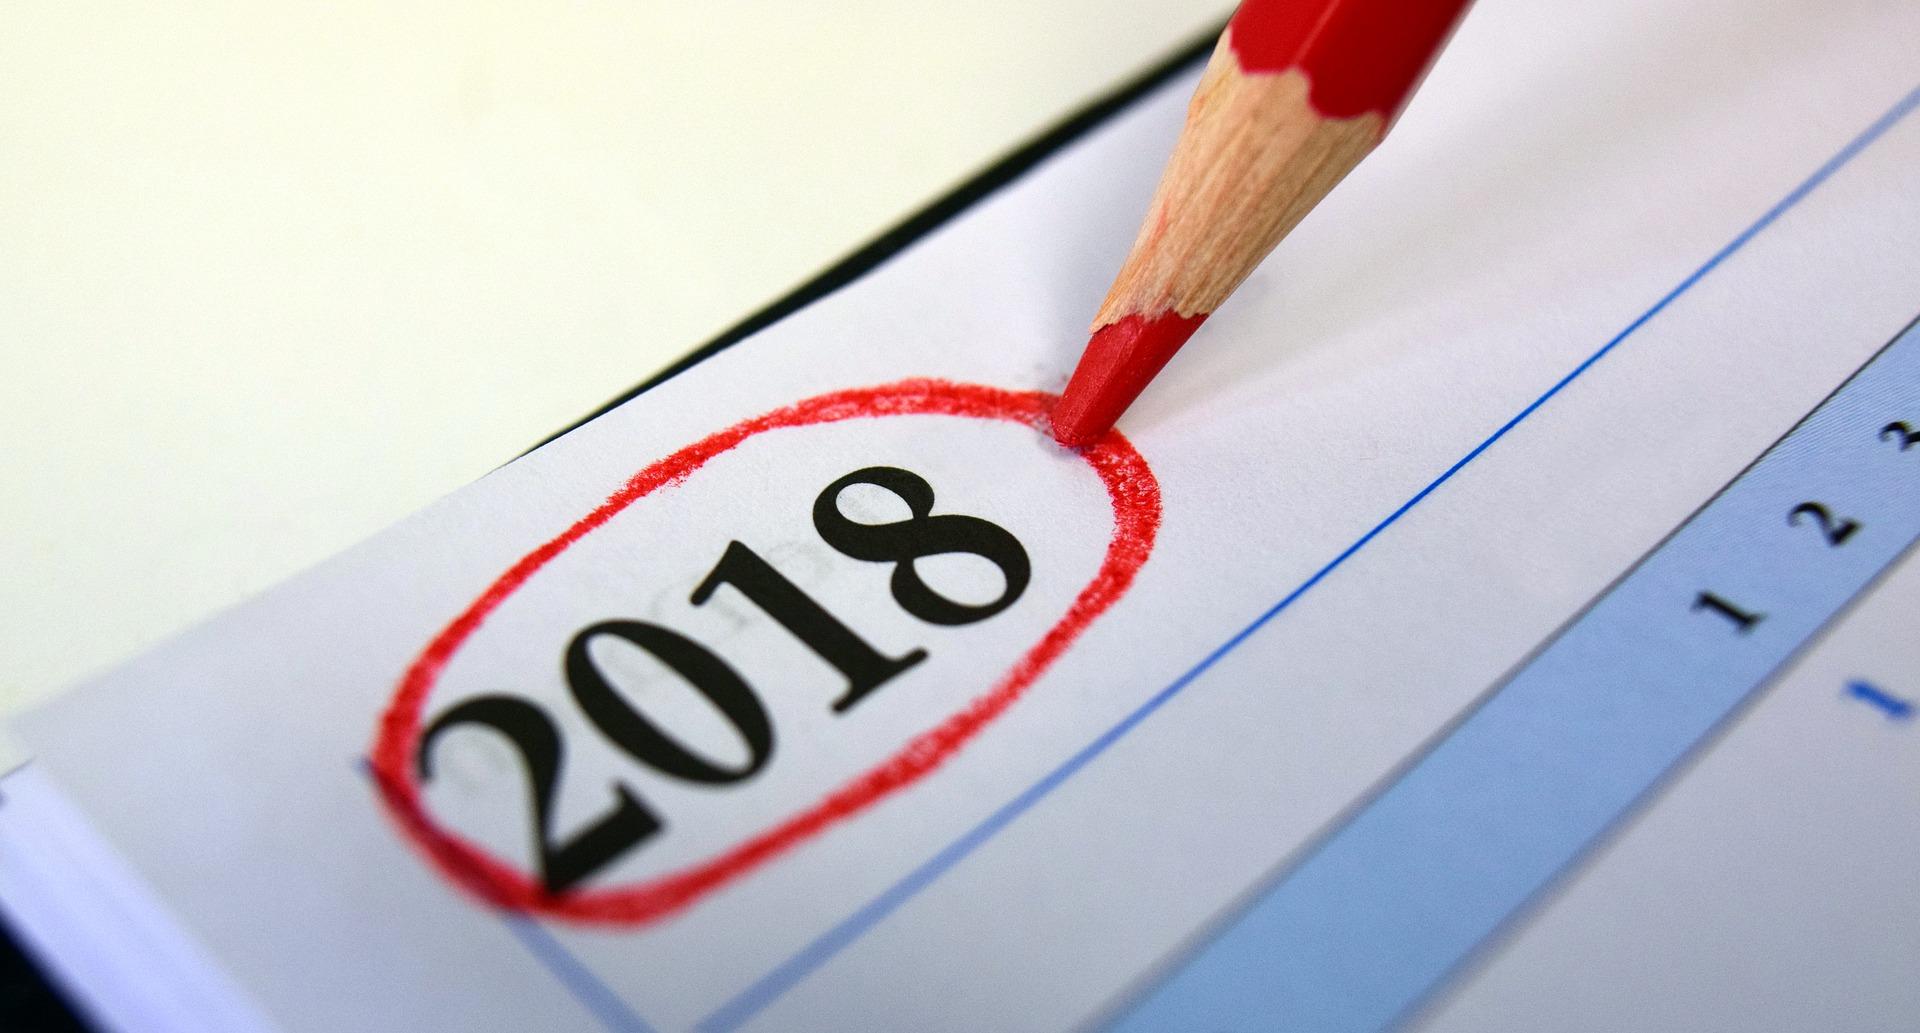 Calendar 2018 by ulleo via Pixabay (Public Domain)